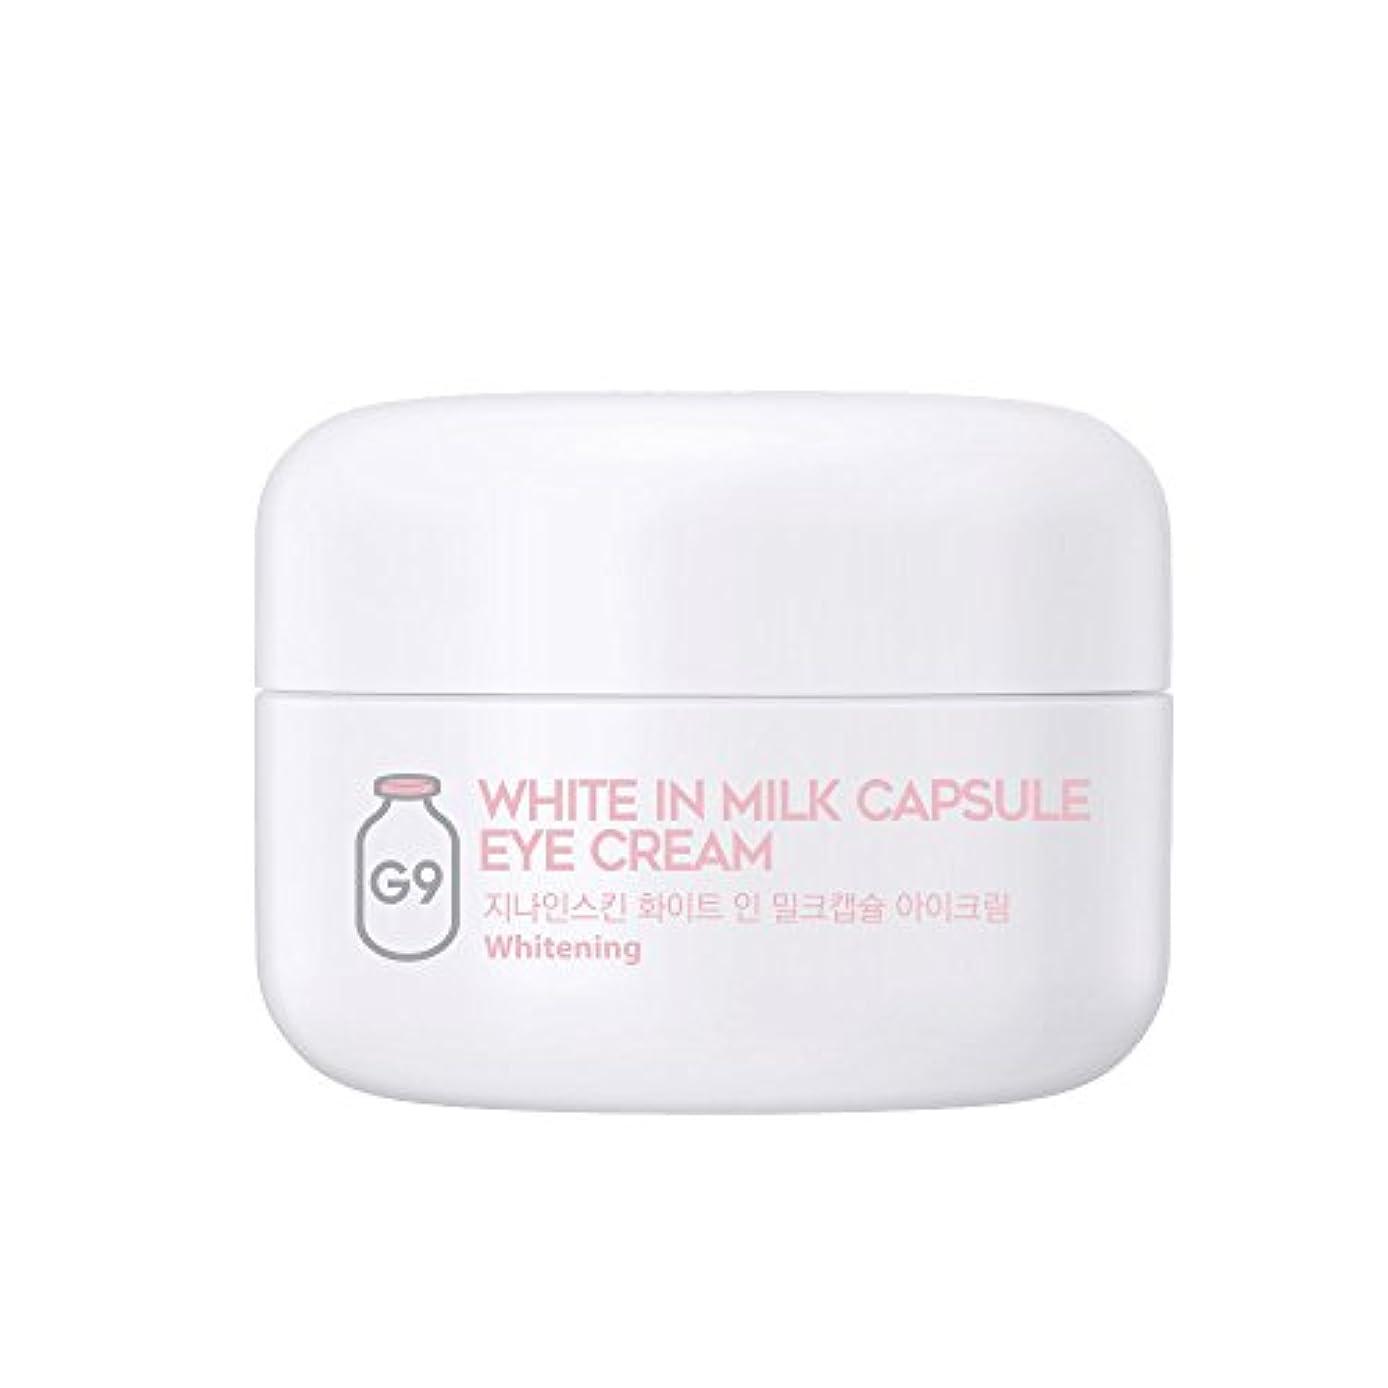 G9SKIN(ベリサム) White In Milk Capsule Eye Cream ホワイトインミルクカプセルアイクリーム 30g